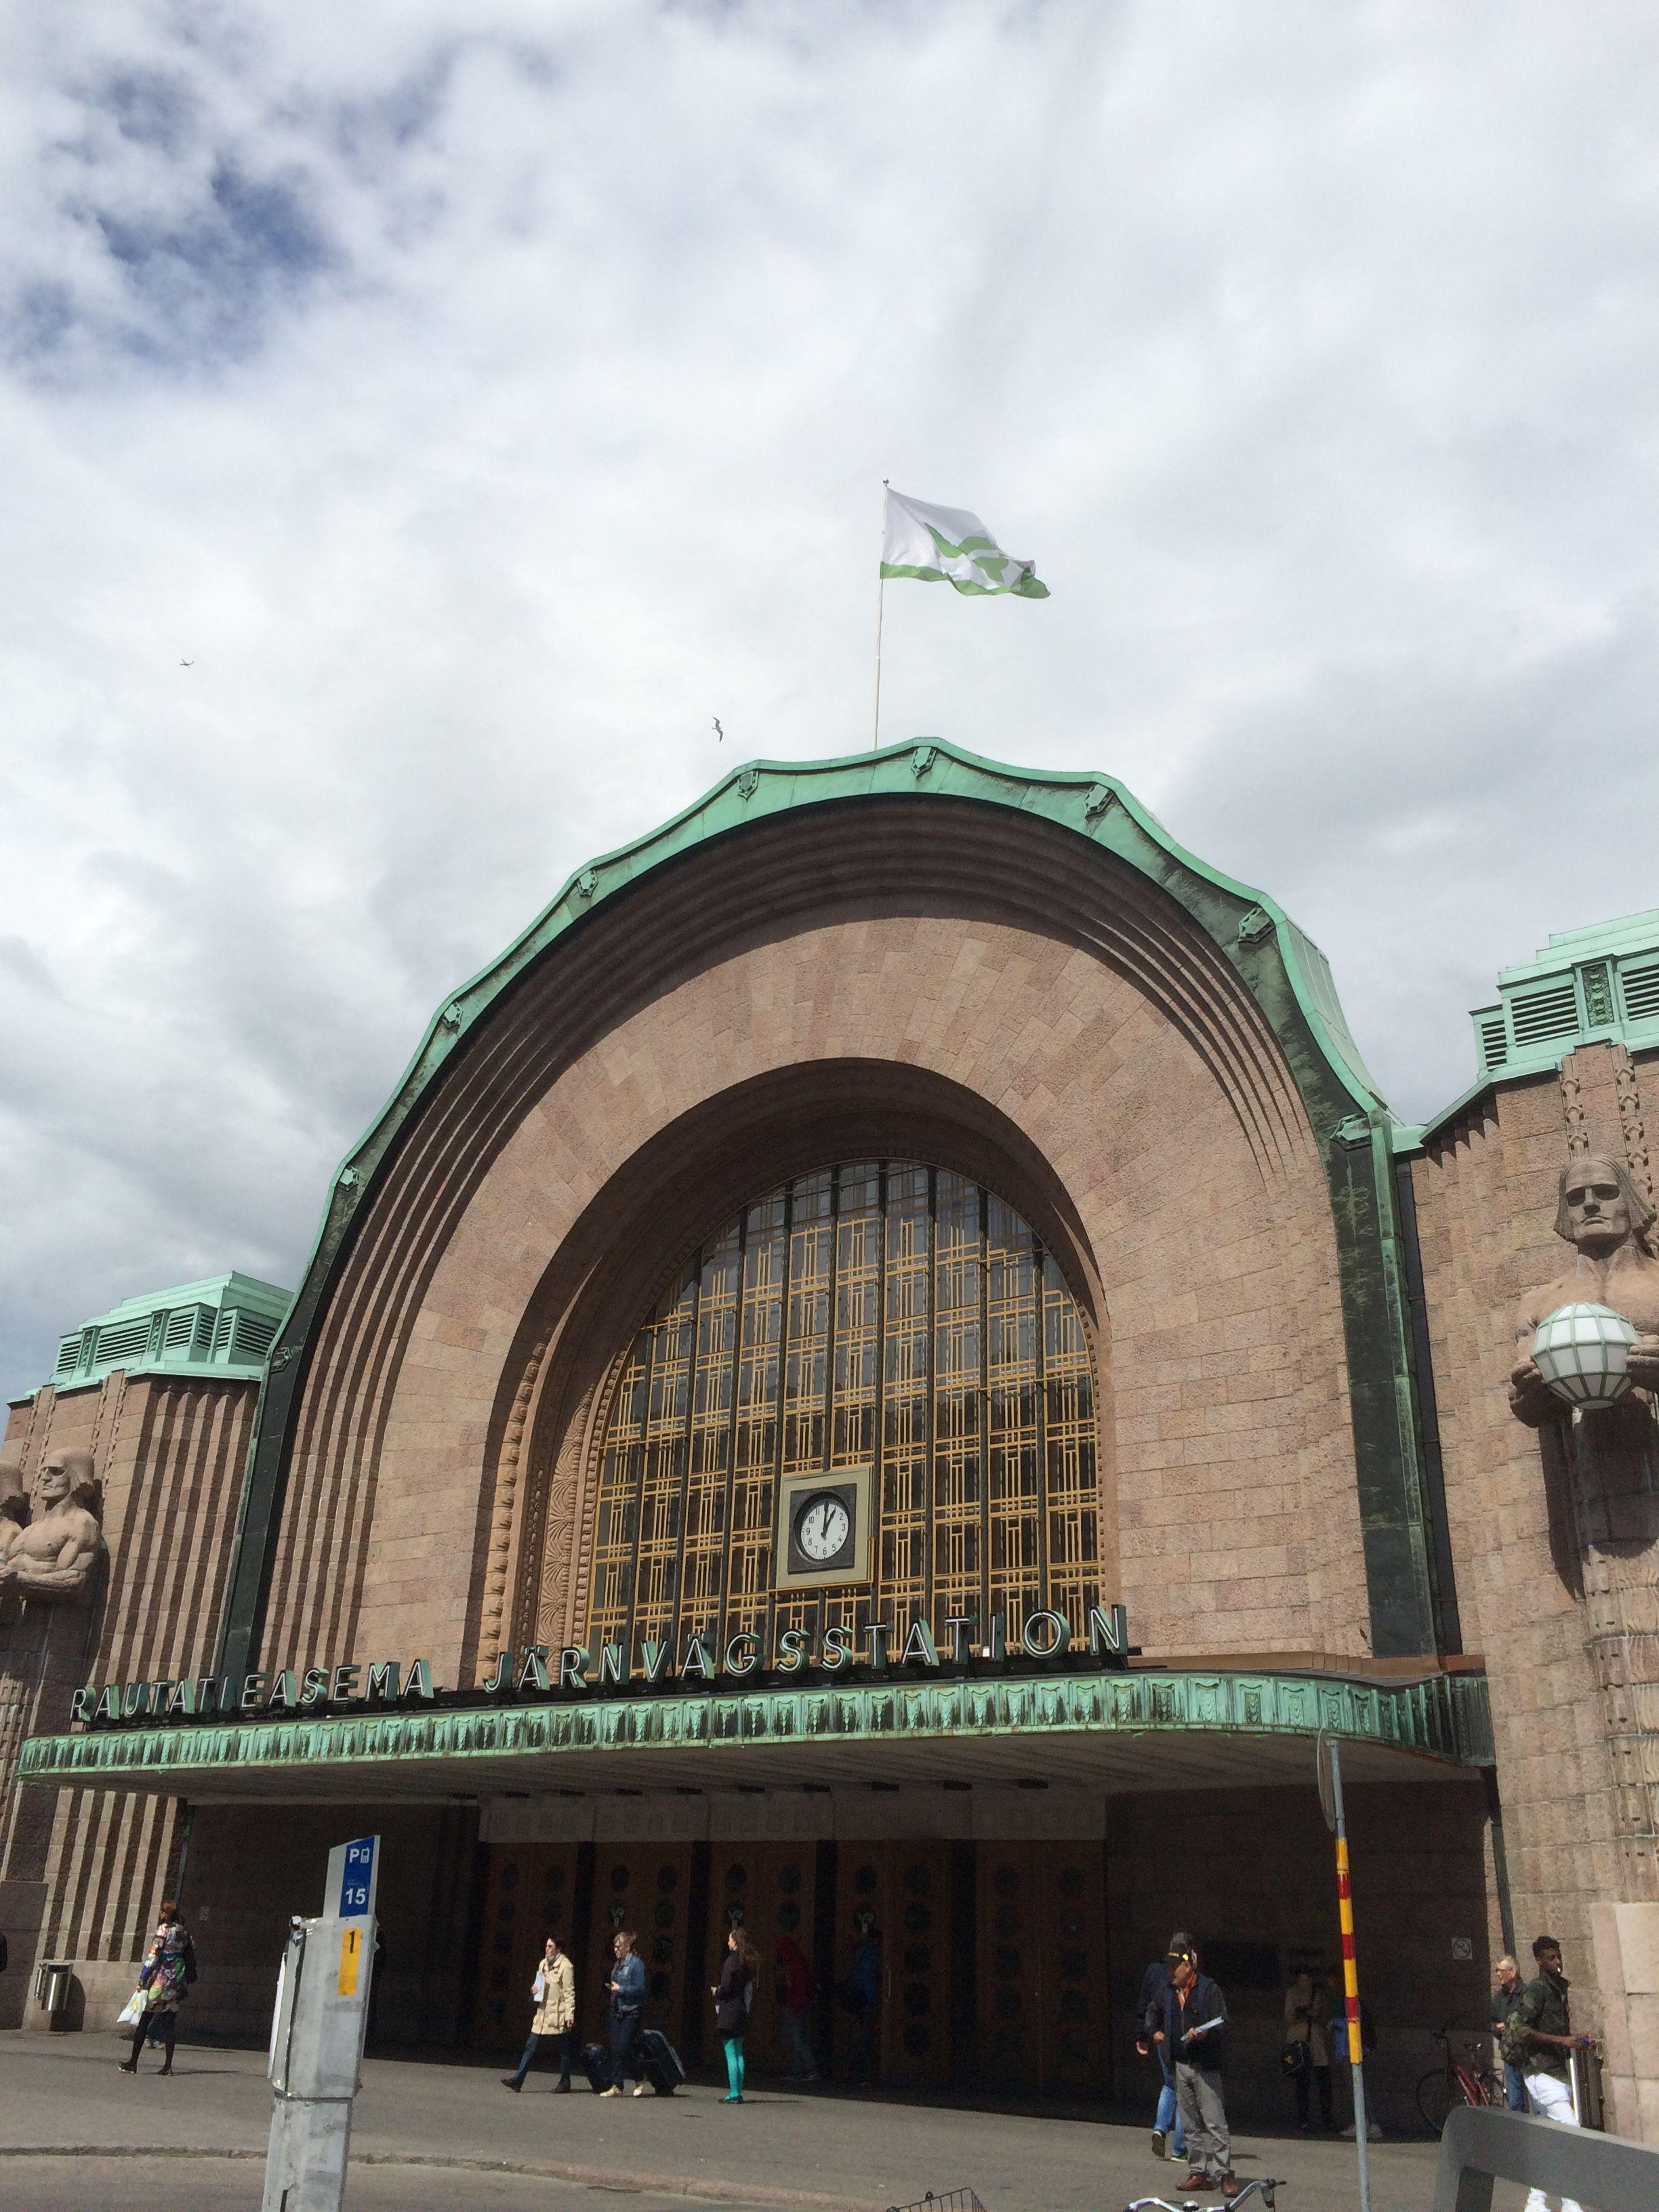 Entrance to the Helsinki Central Railway Station. #travel #finland #scandinavia #europe #helsinki #suomi #architecture #artdeco #nordic